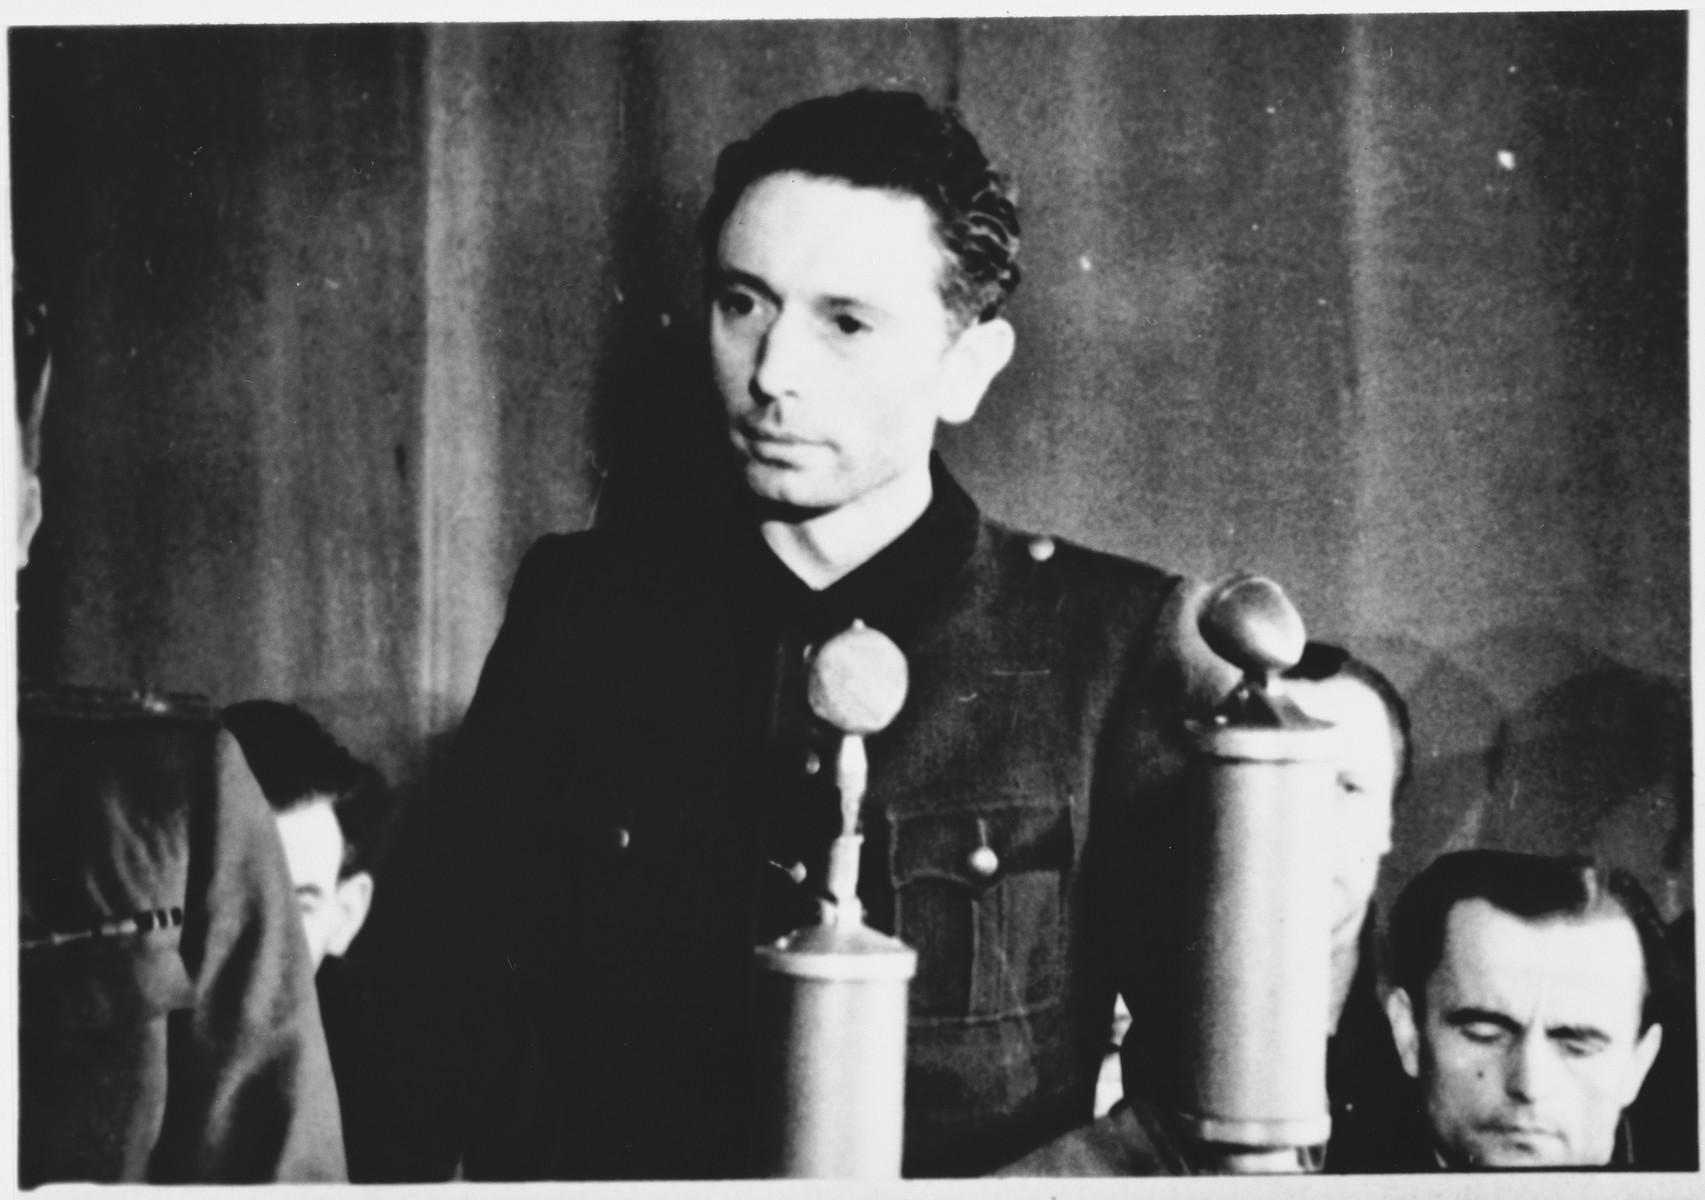 Defendant Heinz (Heinrich Friedrich) Baumkoetter speaks from the dock at the Sachsenhausen concentration camp war crimes trial in Berlin.